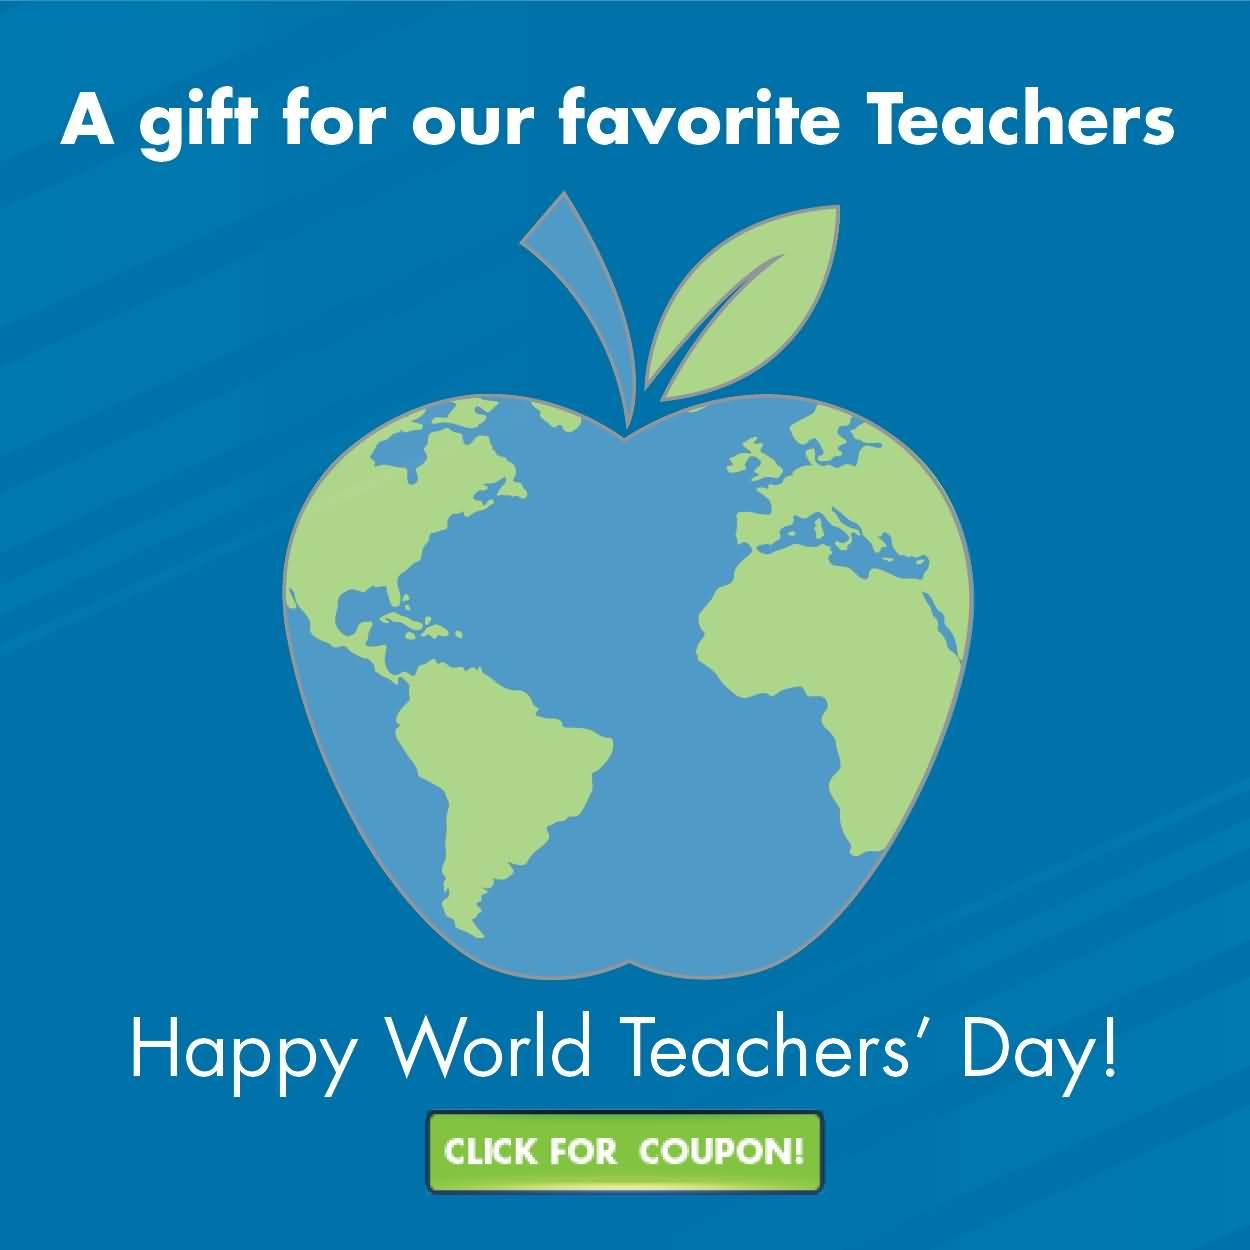 Happy World Teacher's Day Beautiful Wishes Image